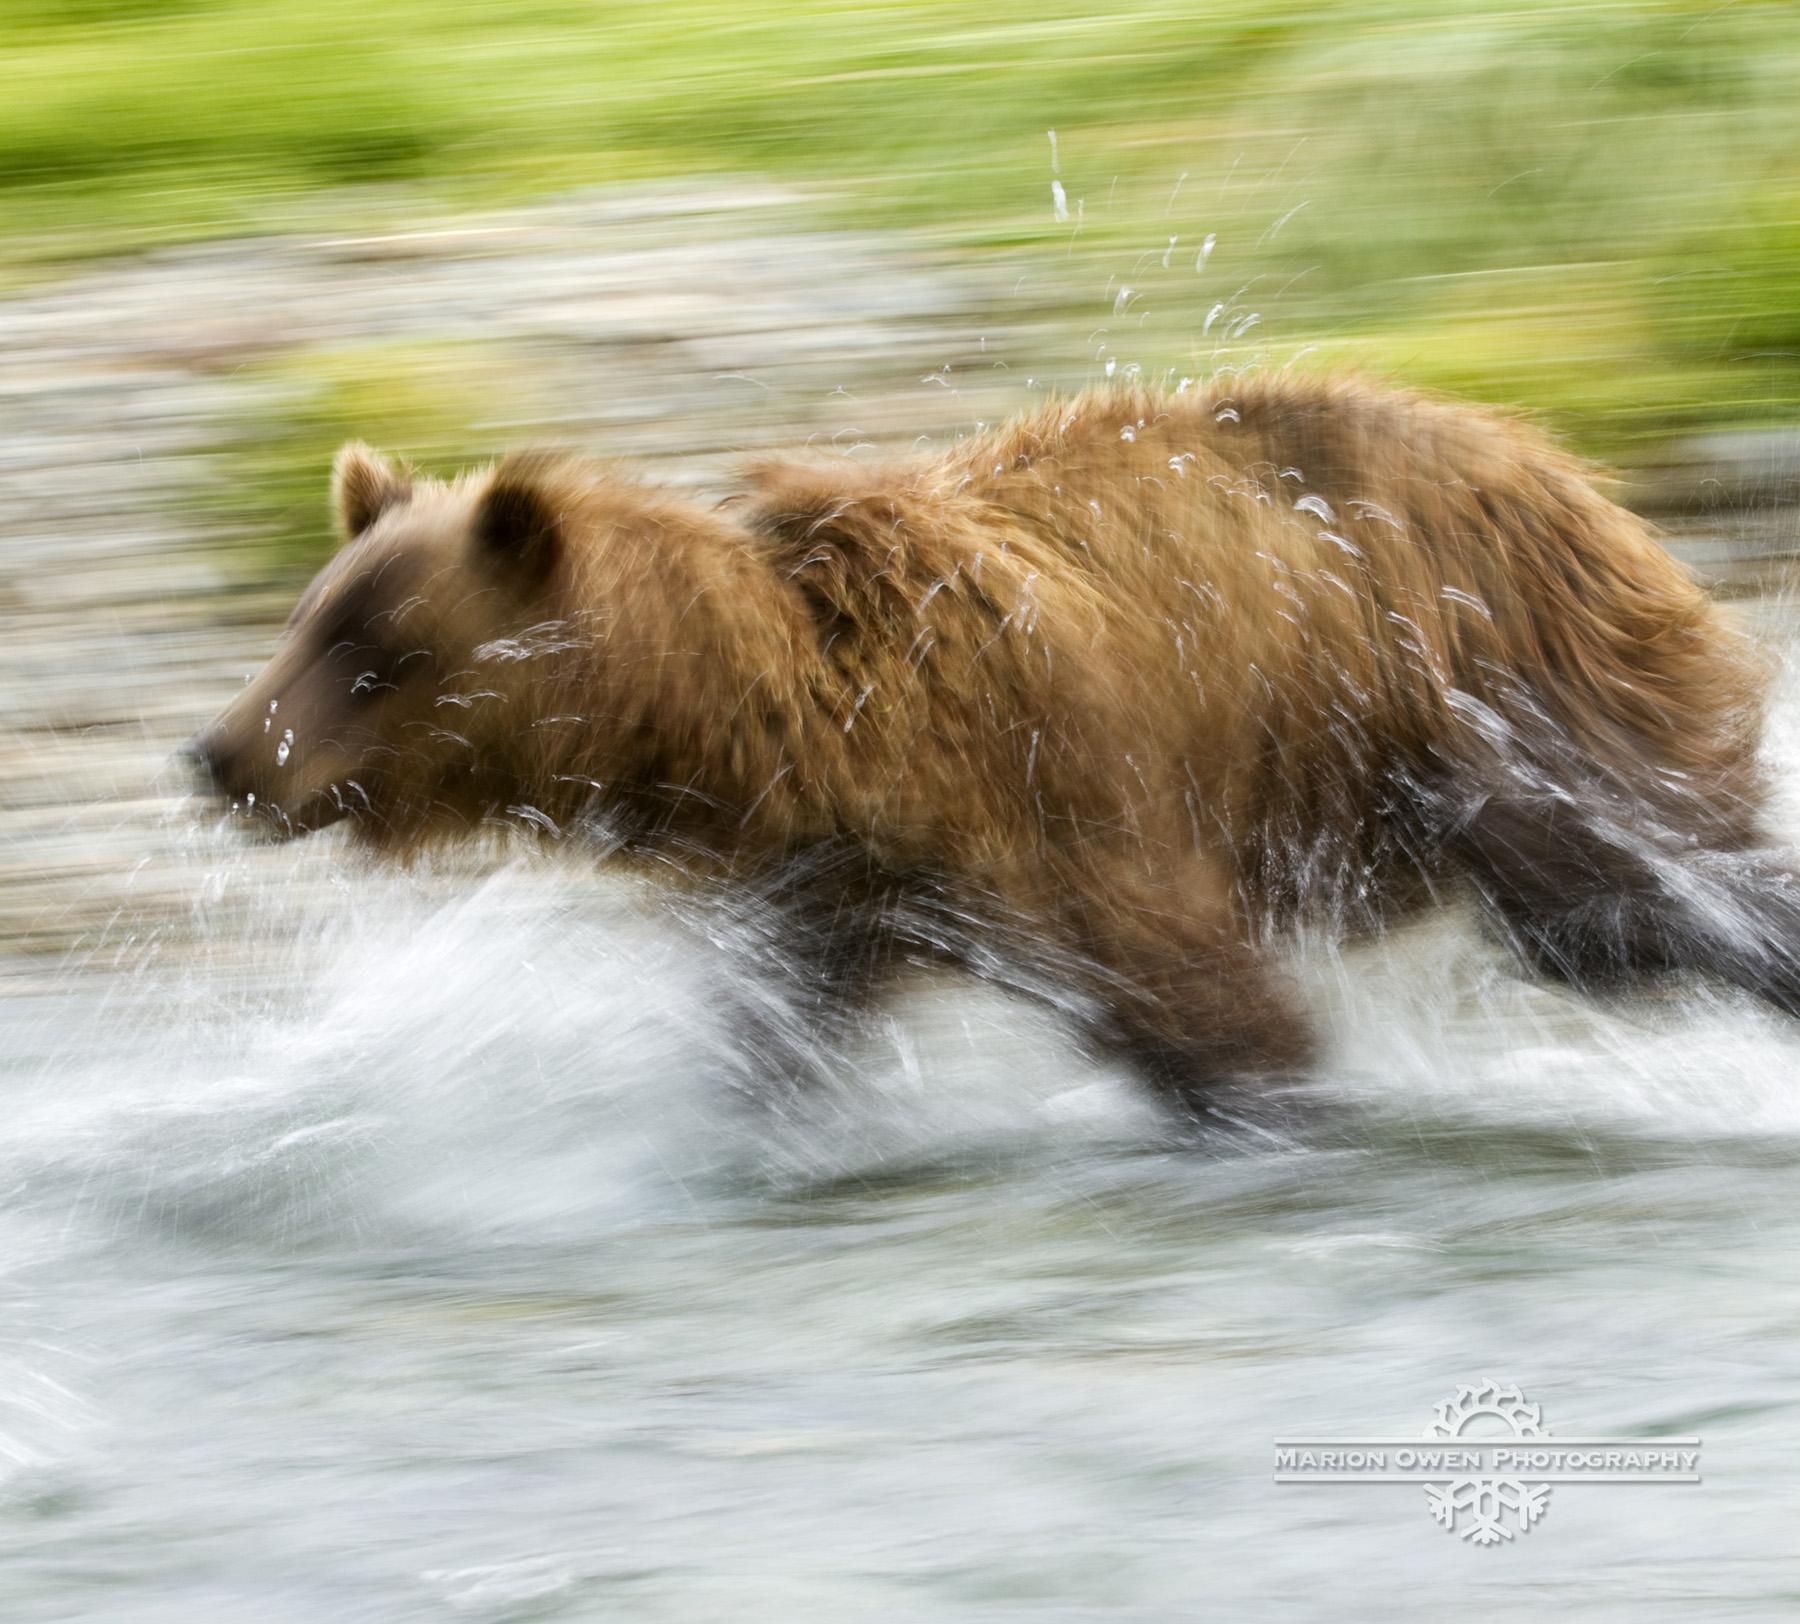 brown, bear, grizzly, katmai, kodiak, alaska, salmon, park, photograph, Marion, Owen